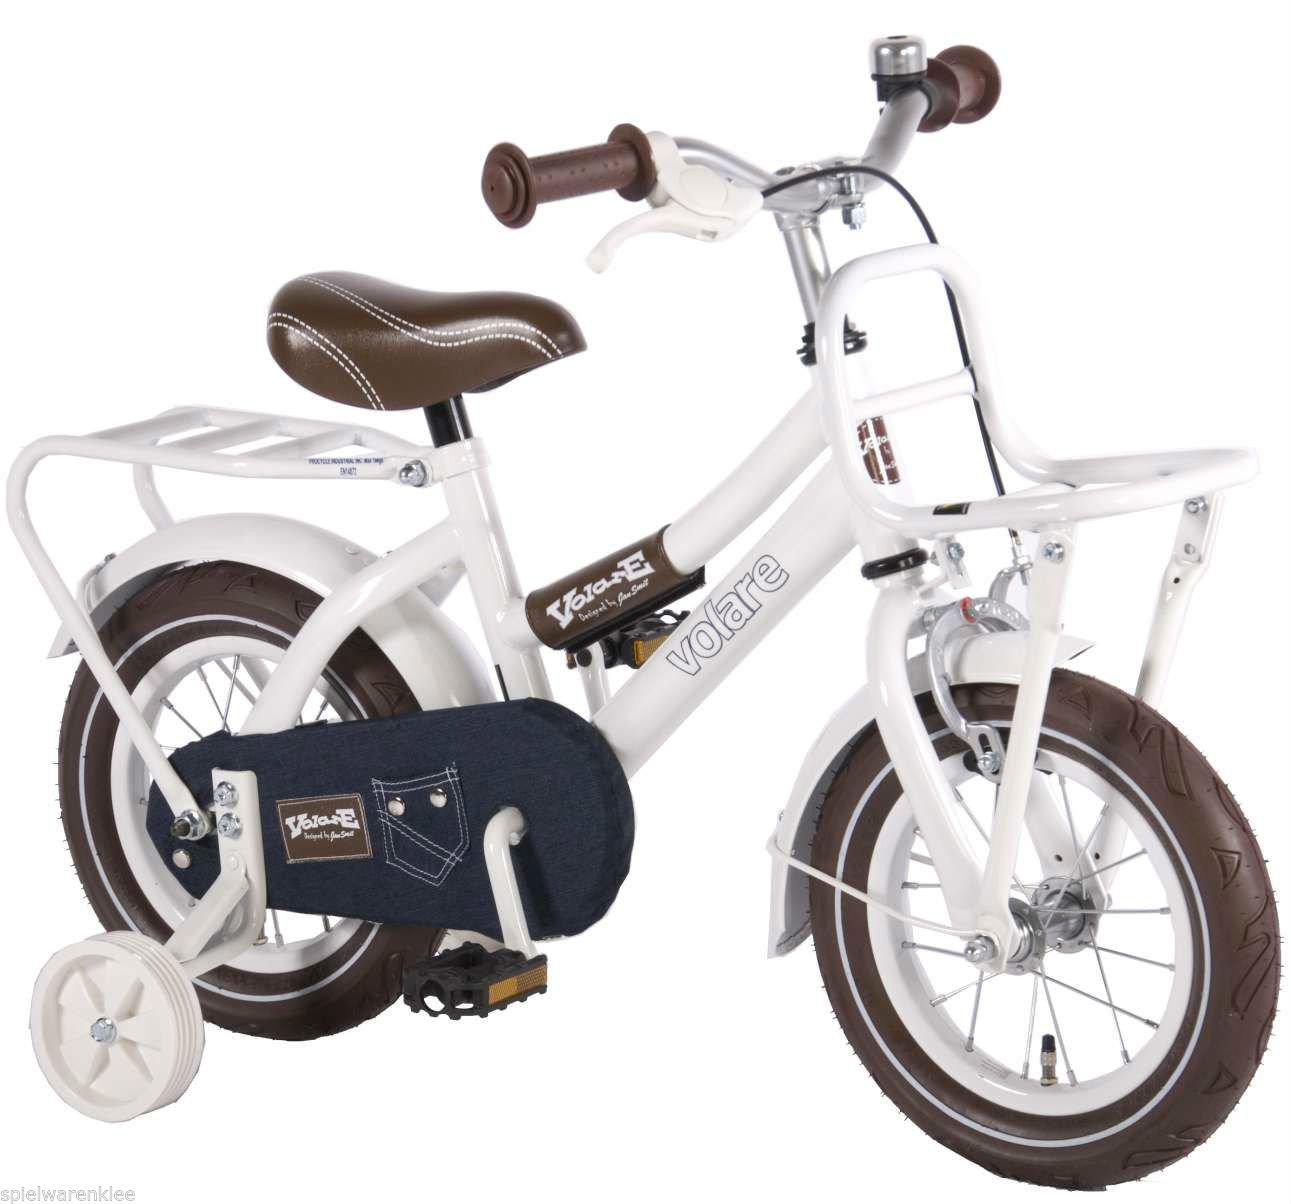 12 Zoll Qualitäts Kinderfahrrad Holland Style Fahrrad mit Stützräder bike 41237